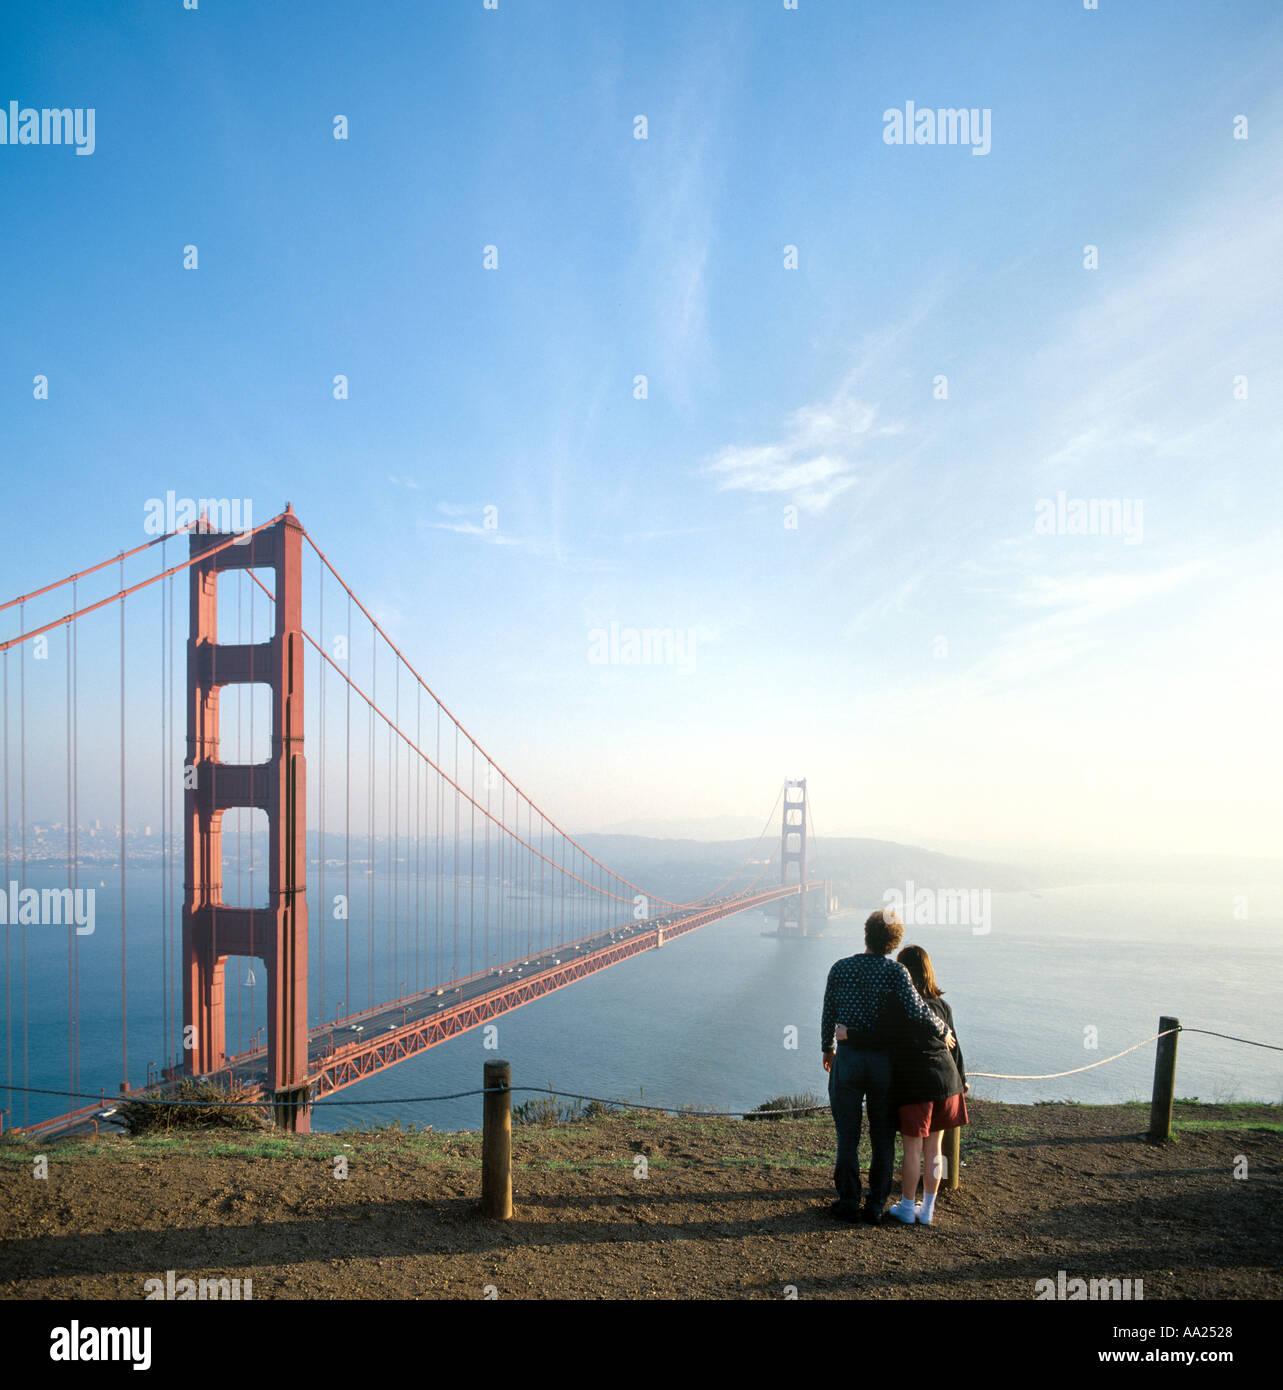 Golden Gate Bridge San Francisco California Sunset Picture: Couple Looking Out Over The Golden Gate Bridge, San